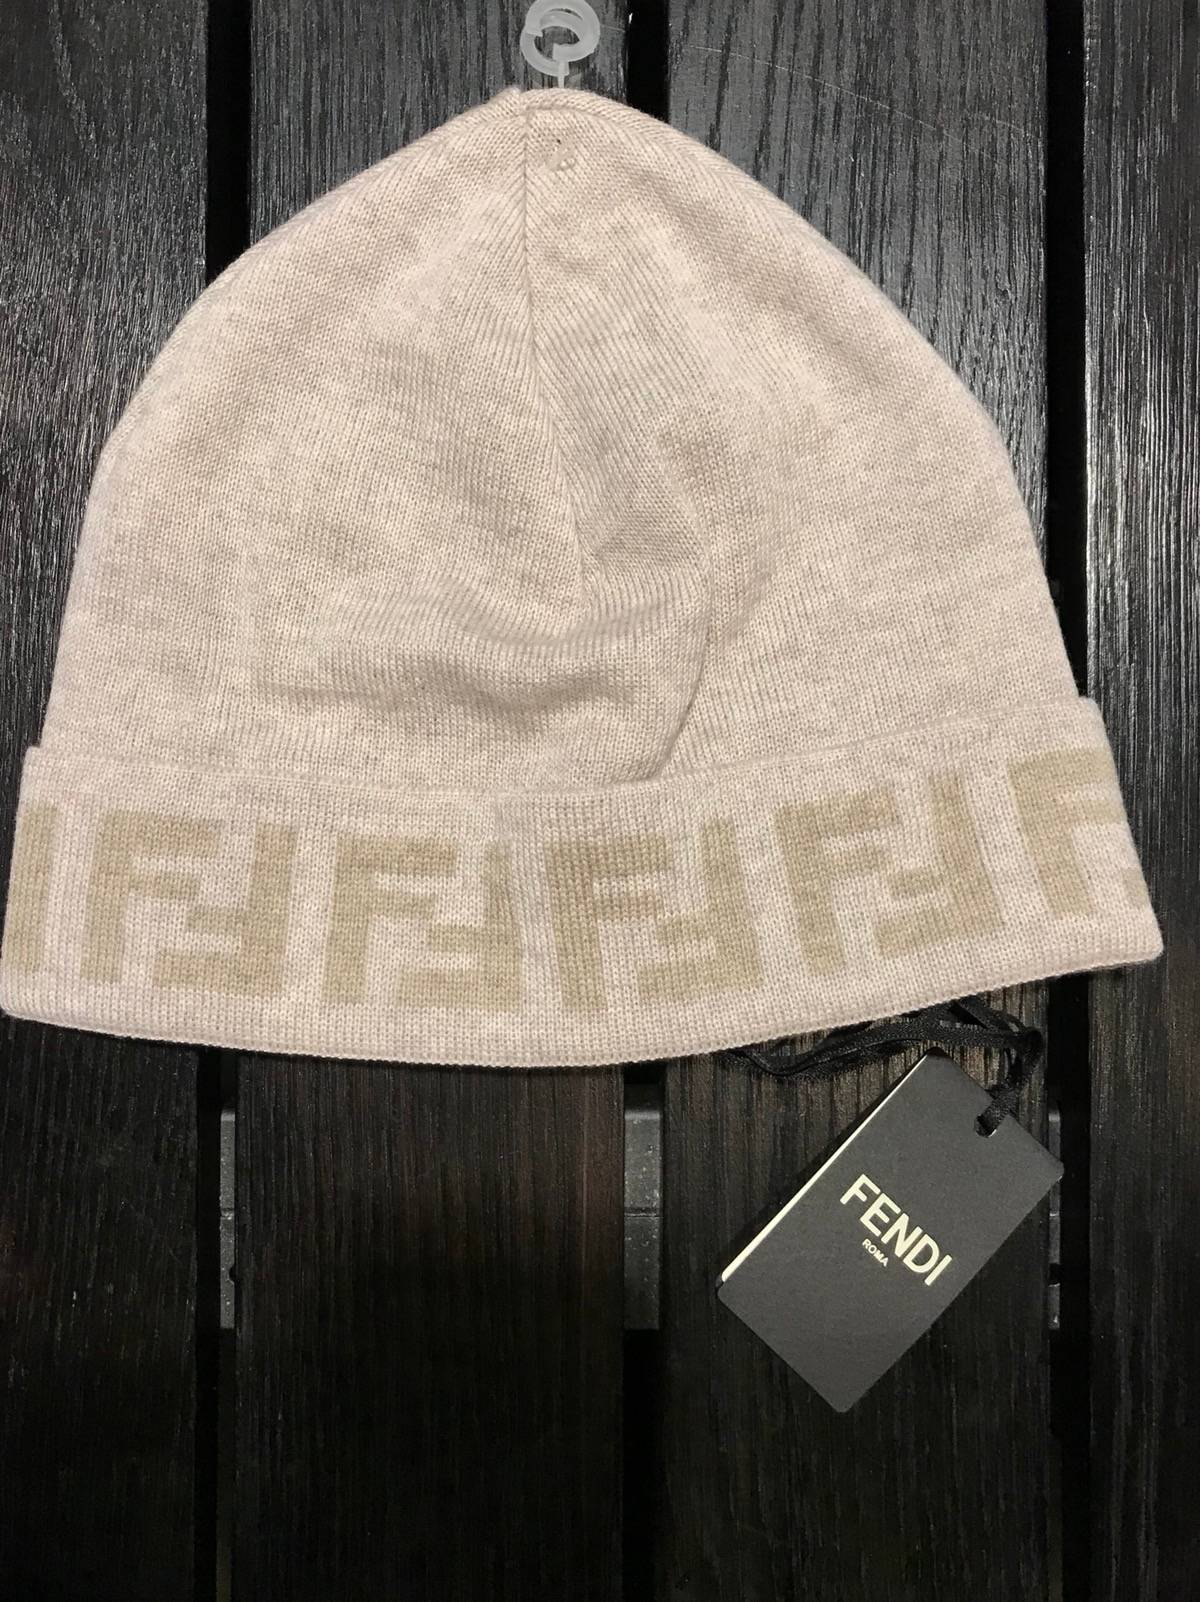 451fca6173a Fendi Fendi Lana-wool Hat Fall Winter Size one size - Hats for Sale -  Grailed